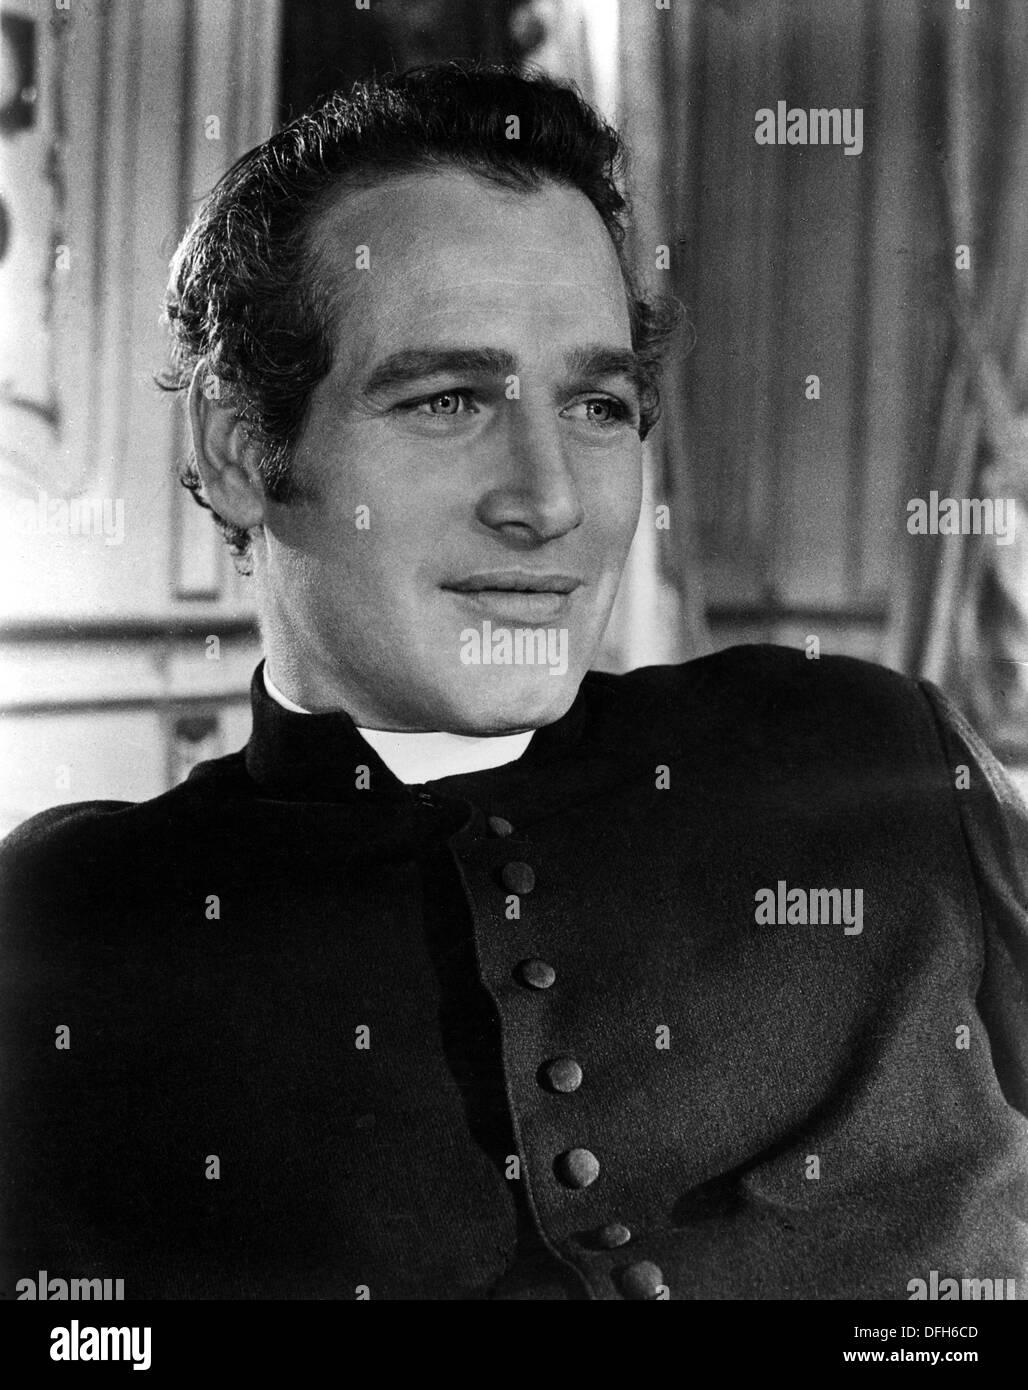 5bda483f Paul Newman on-set of the Film, Lady L, 1966 Stock Photo: 61229181 ...